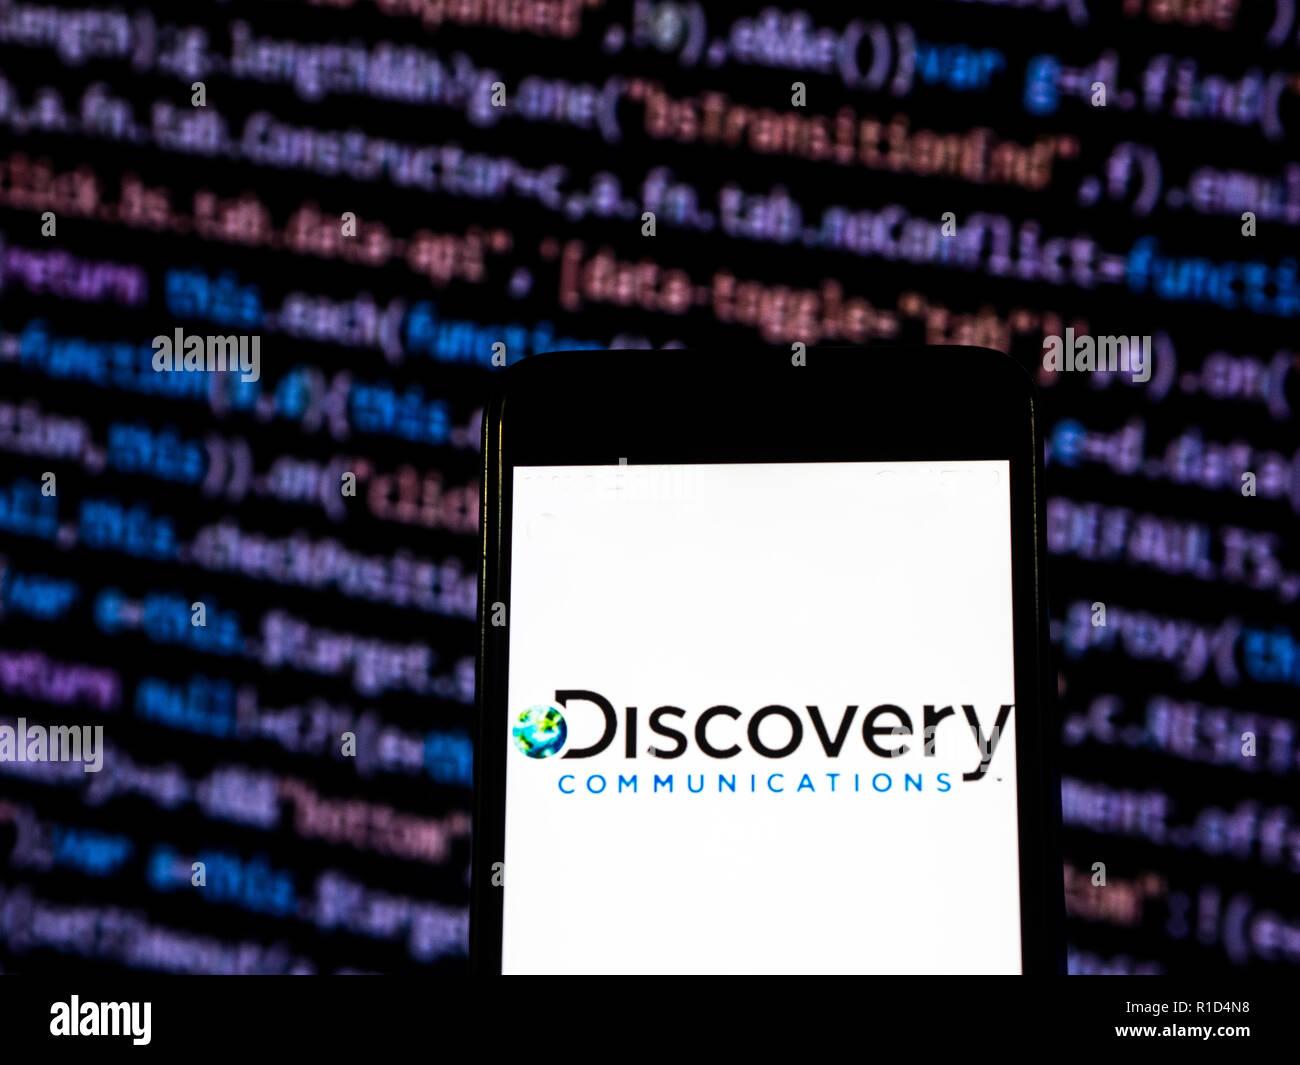 Discovery Communications Mass Media Company Logo Seen